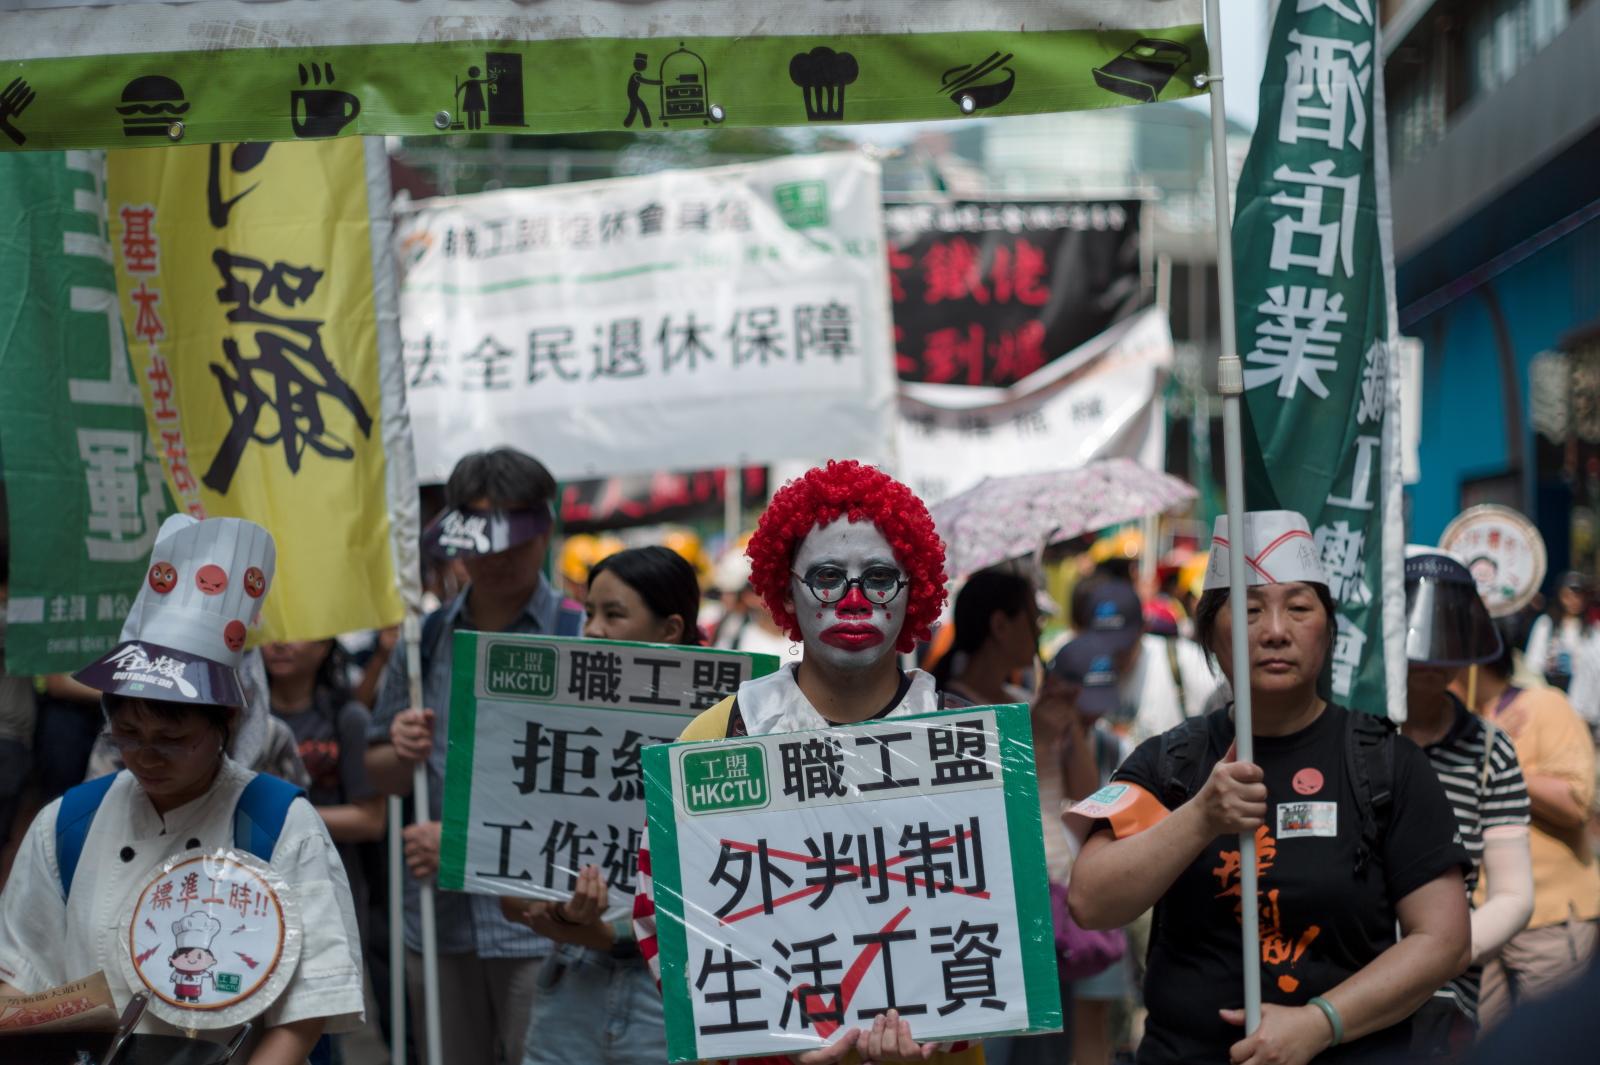 Święto Pracy w Hong Kongu EPA/JEROME FAVRE